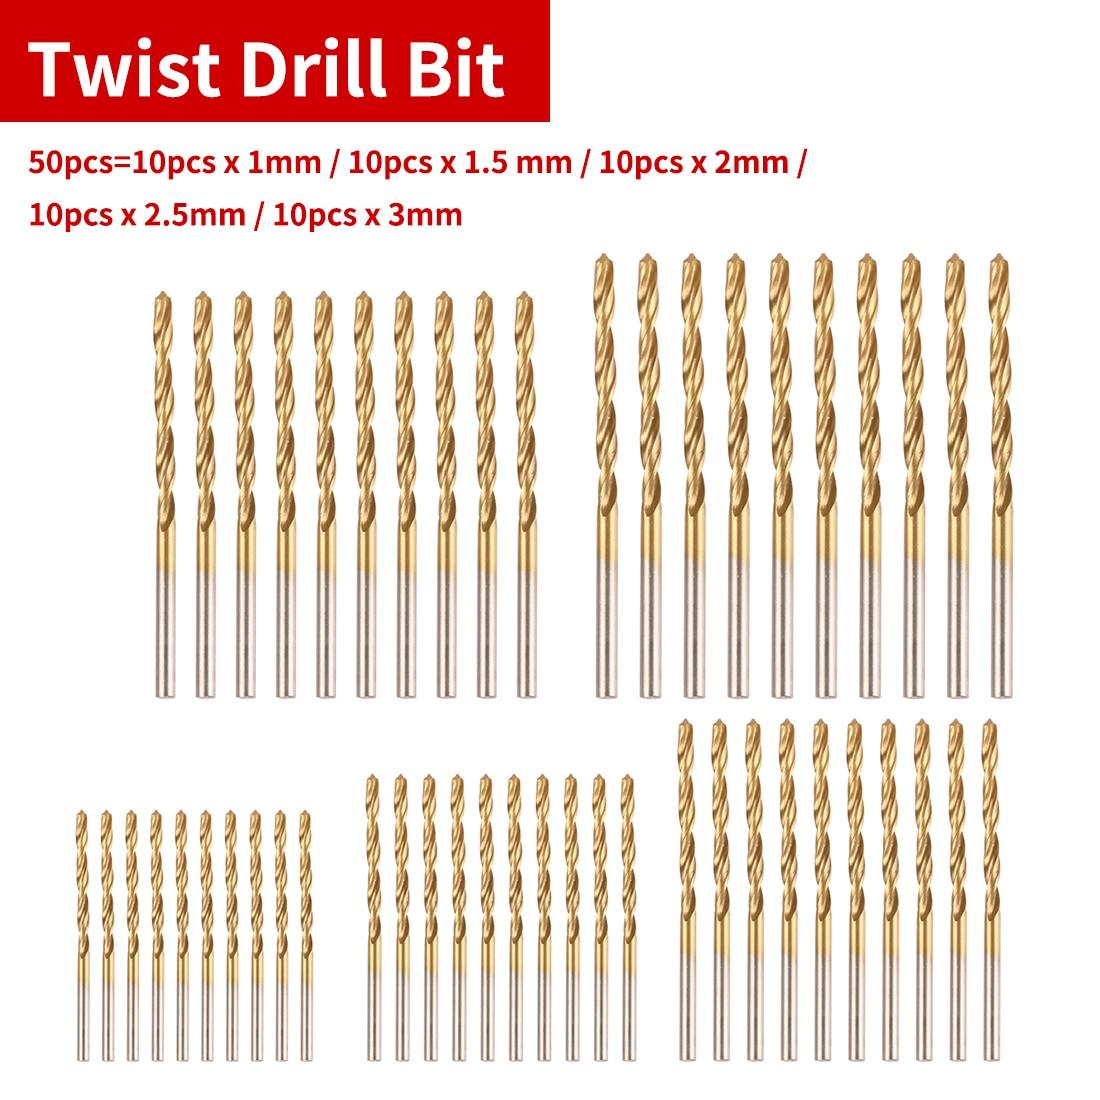 Power Drilling Tools 1mm/1.5mm/2mm/2.5mm/3mm 50pcs HSS Titanium Coated Drill Bit For Angle Iron/Wood/Plastic/Aluminum